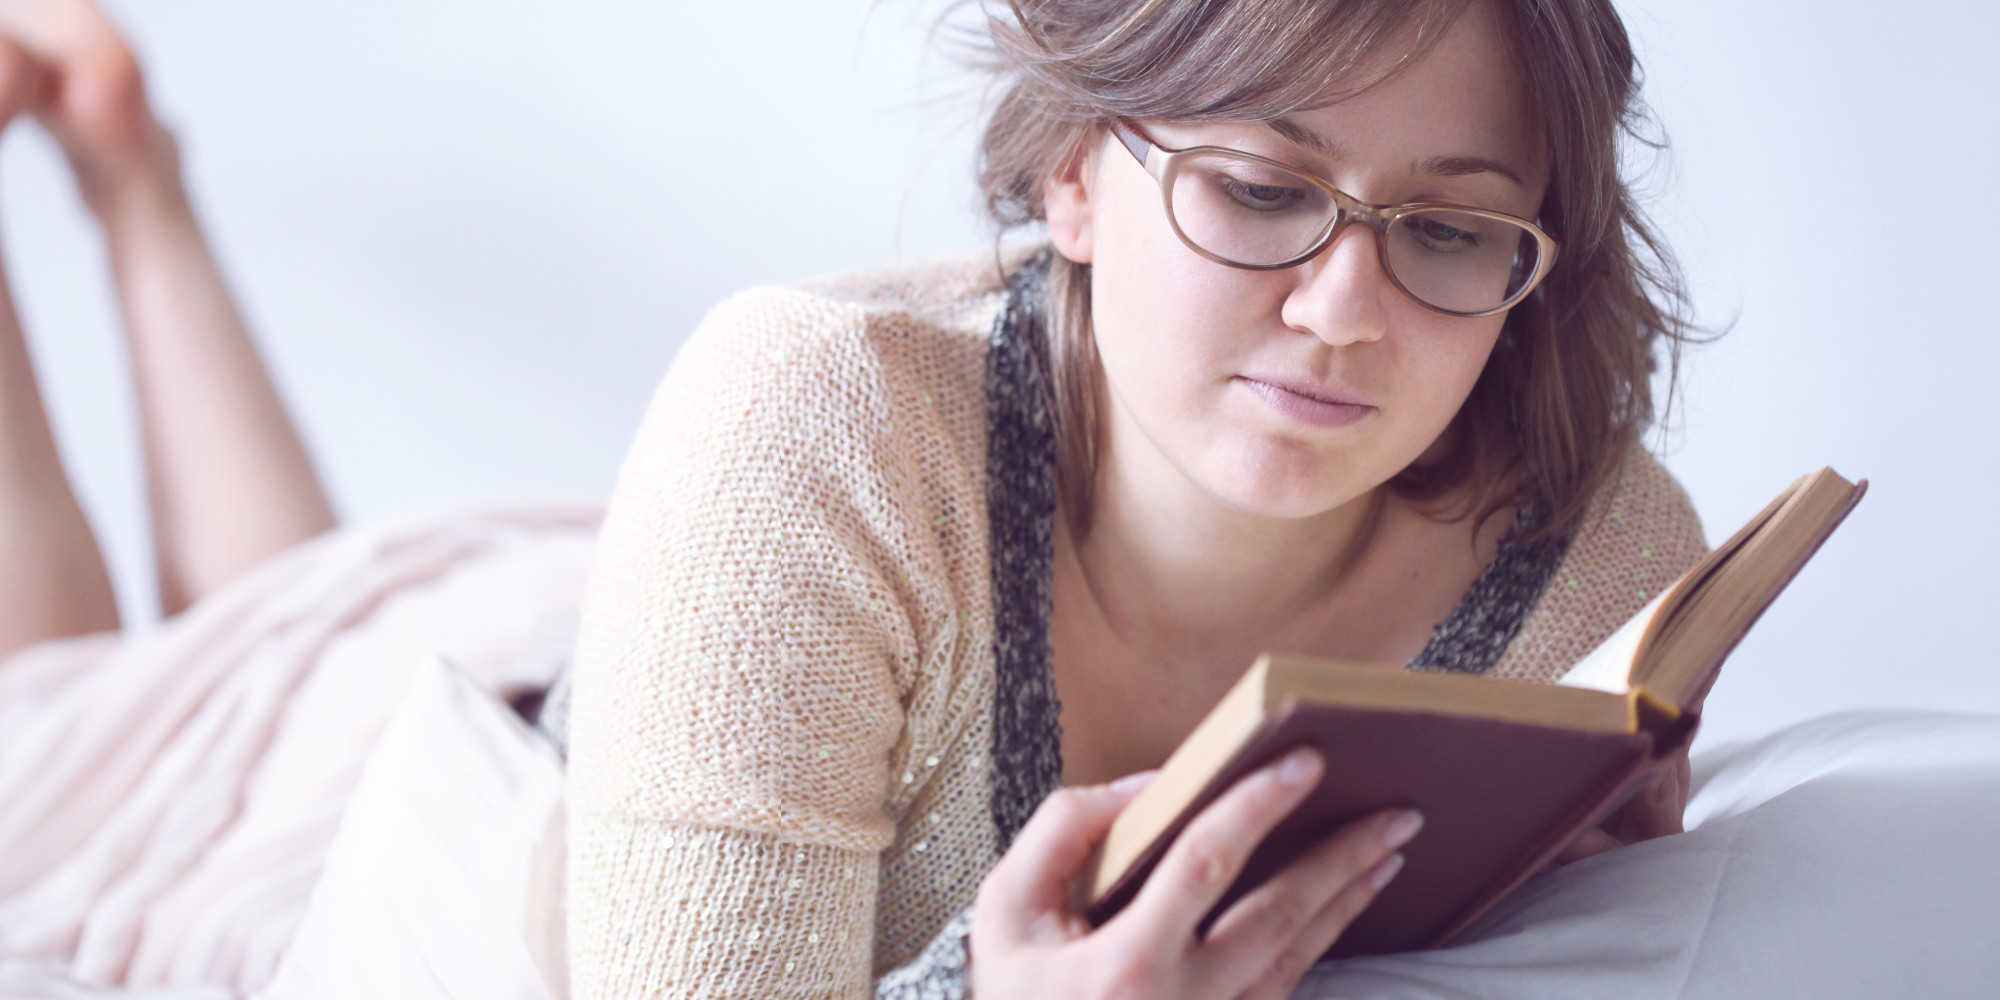 Woman reading a book at a bar